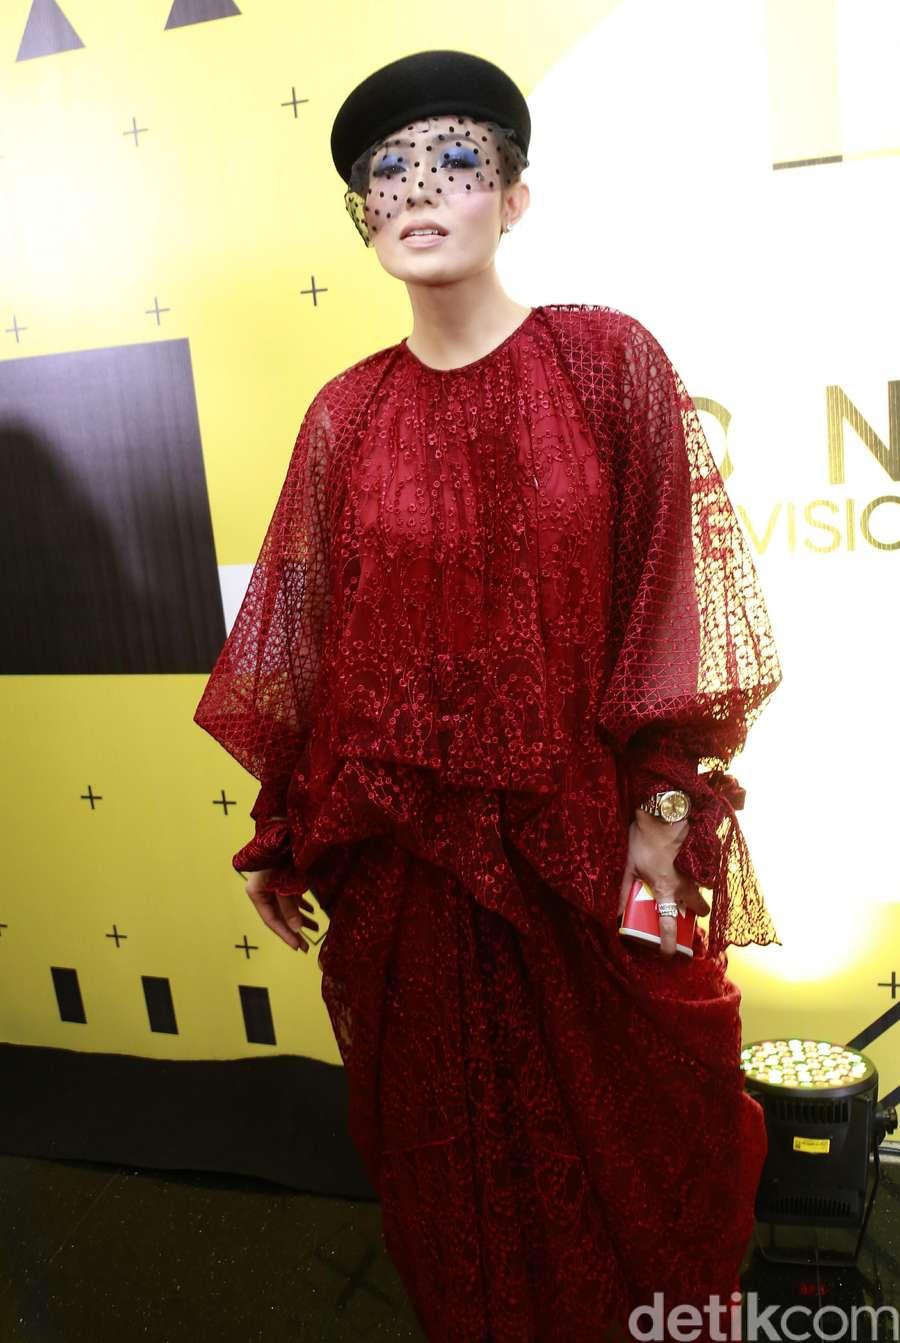 Ini Penampilan Ayu Dewi yang Dipuji Cantik oleh Cha Eunwoo